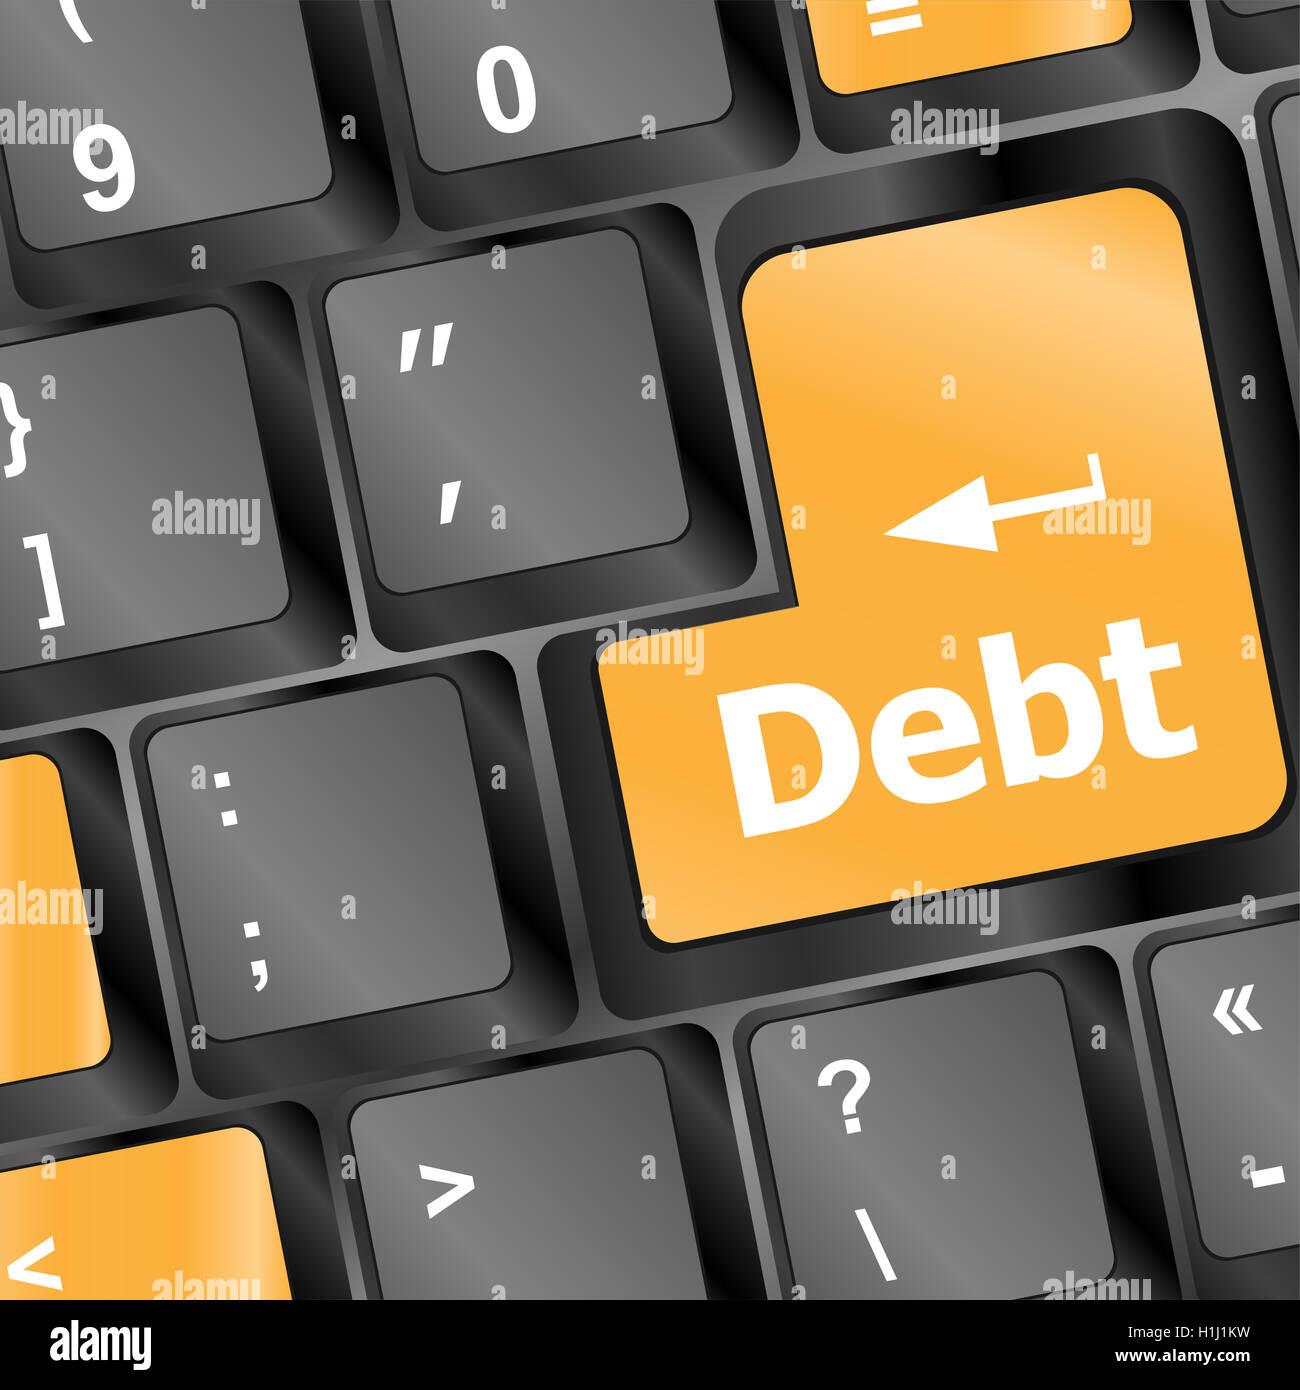 Debt on keyboard - Stock Image